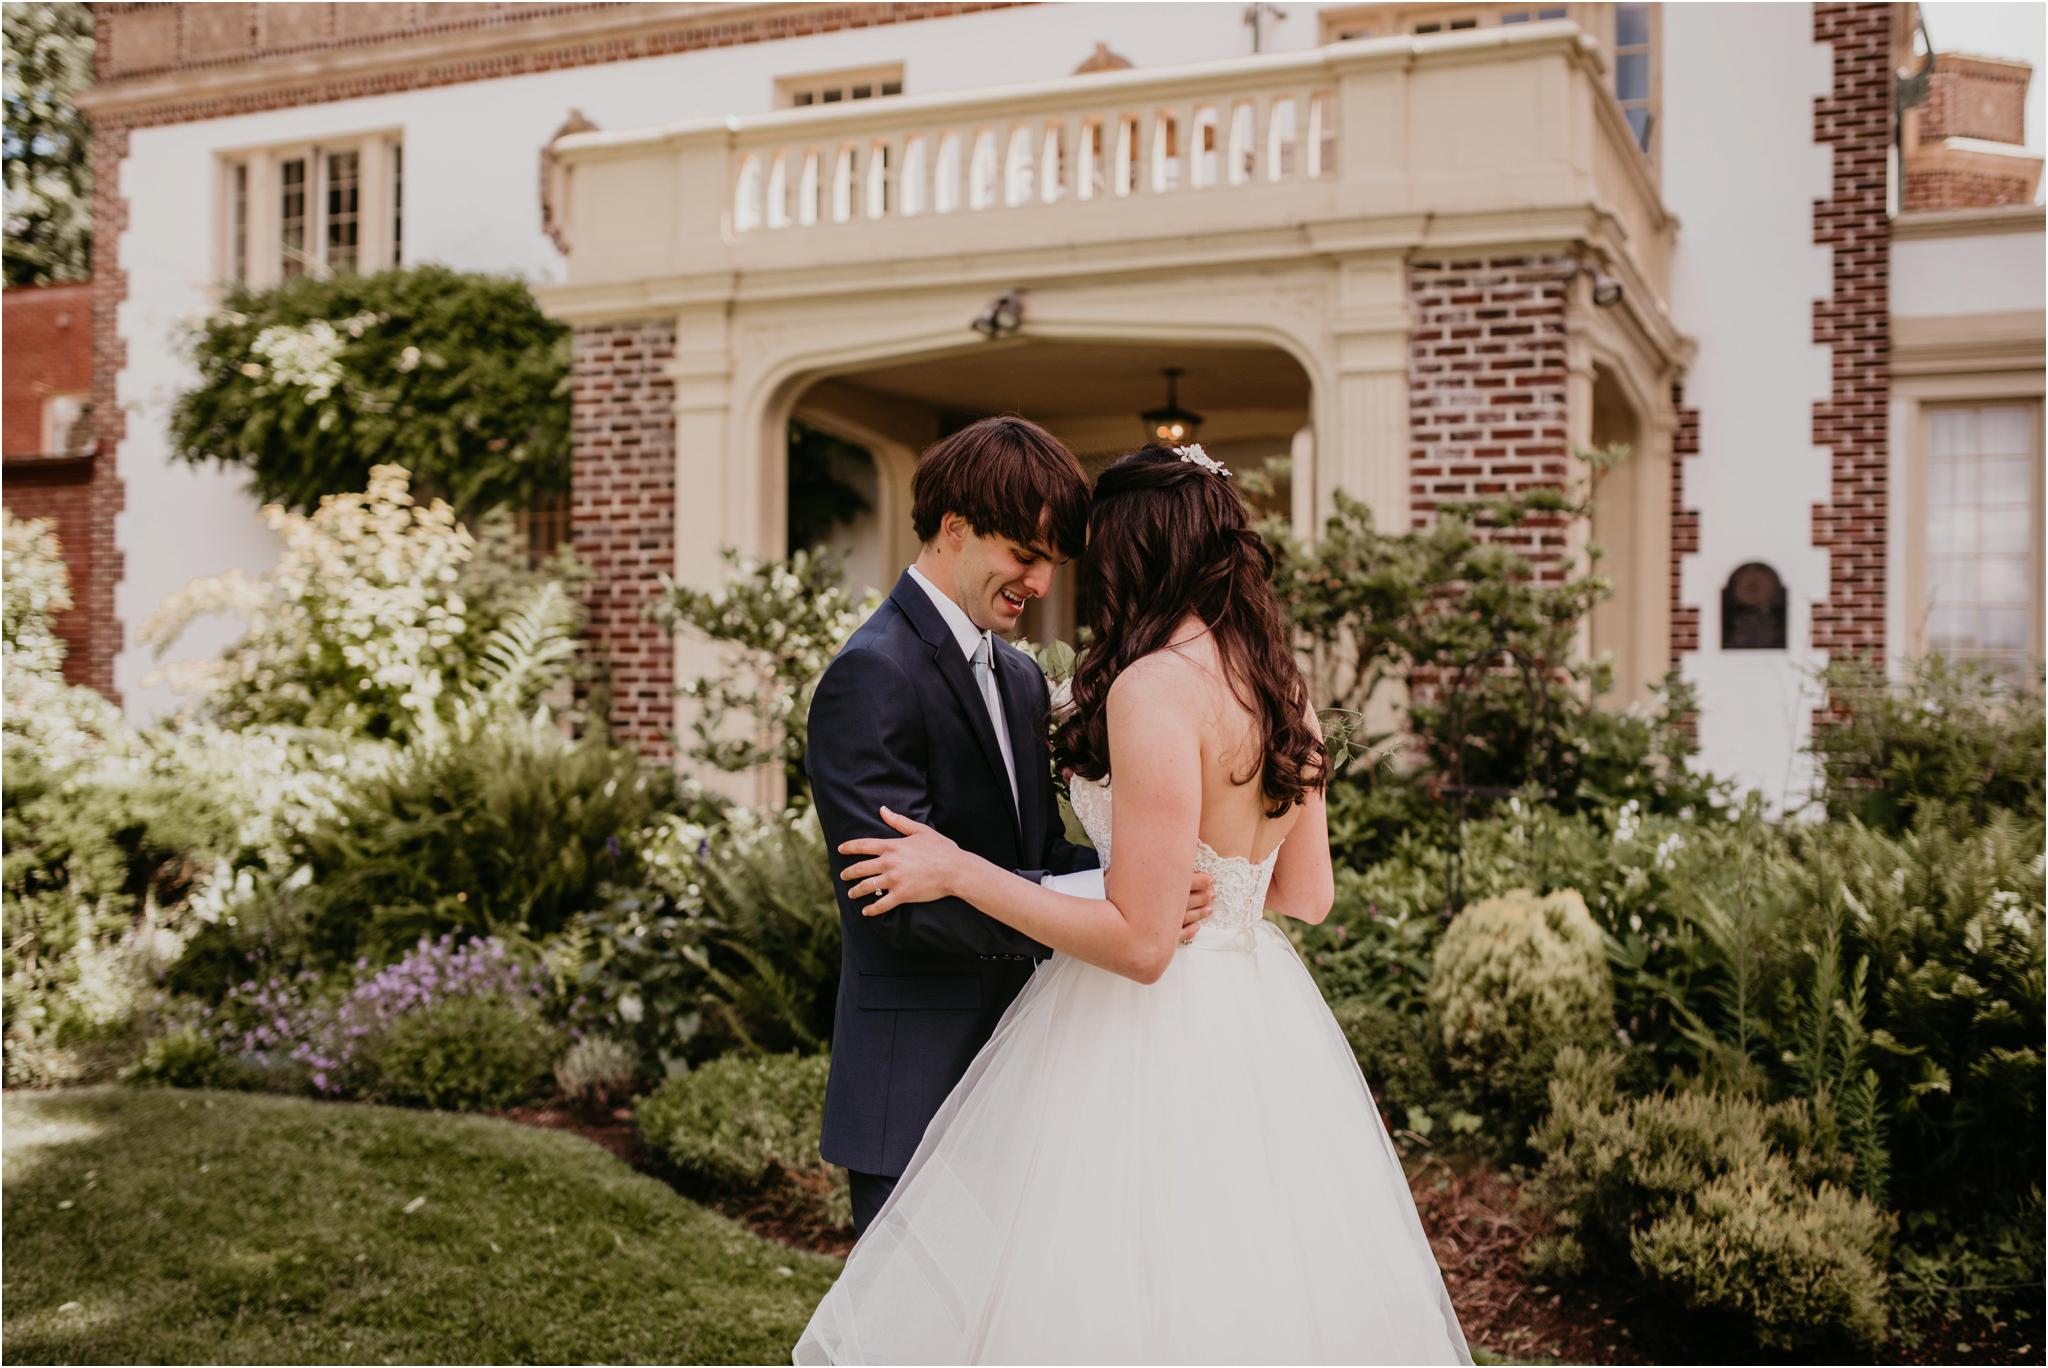 chance-and-ondrea-lairmont-manor-wedding-seattle-photographer-031.jpg